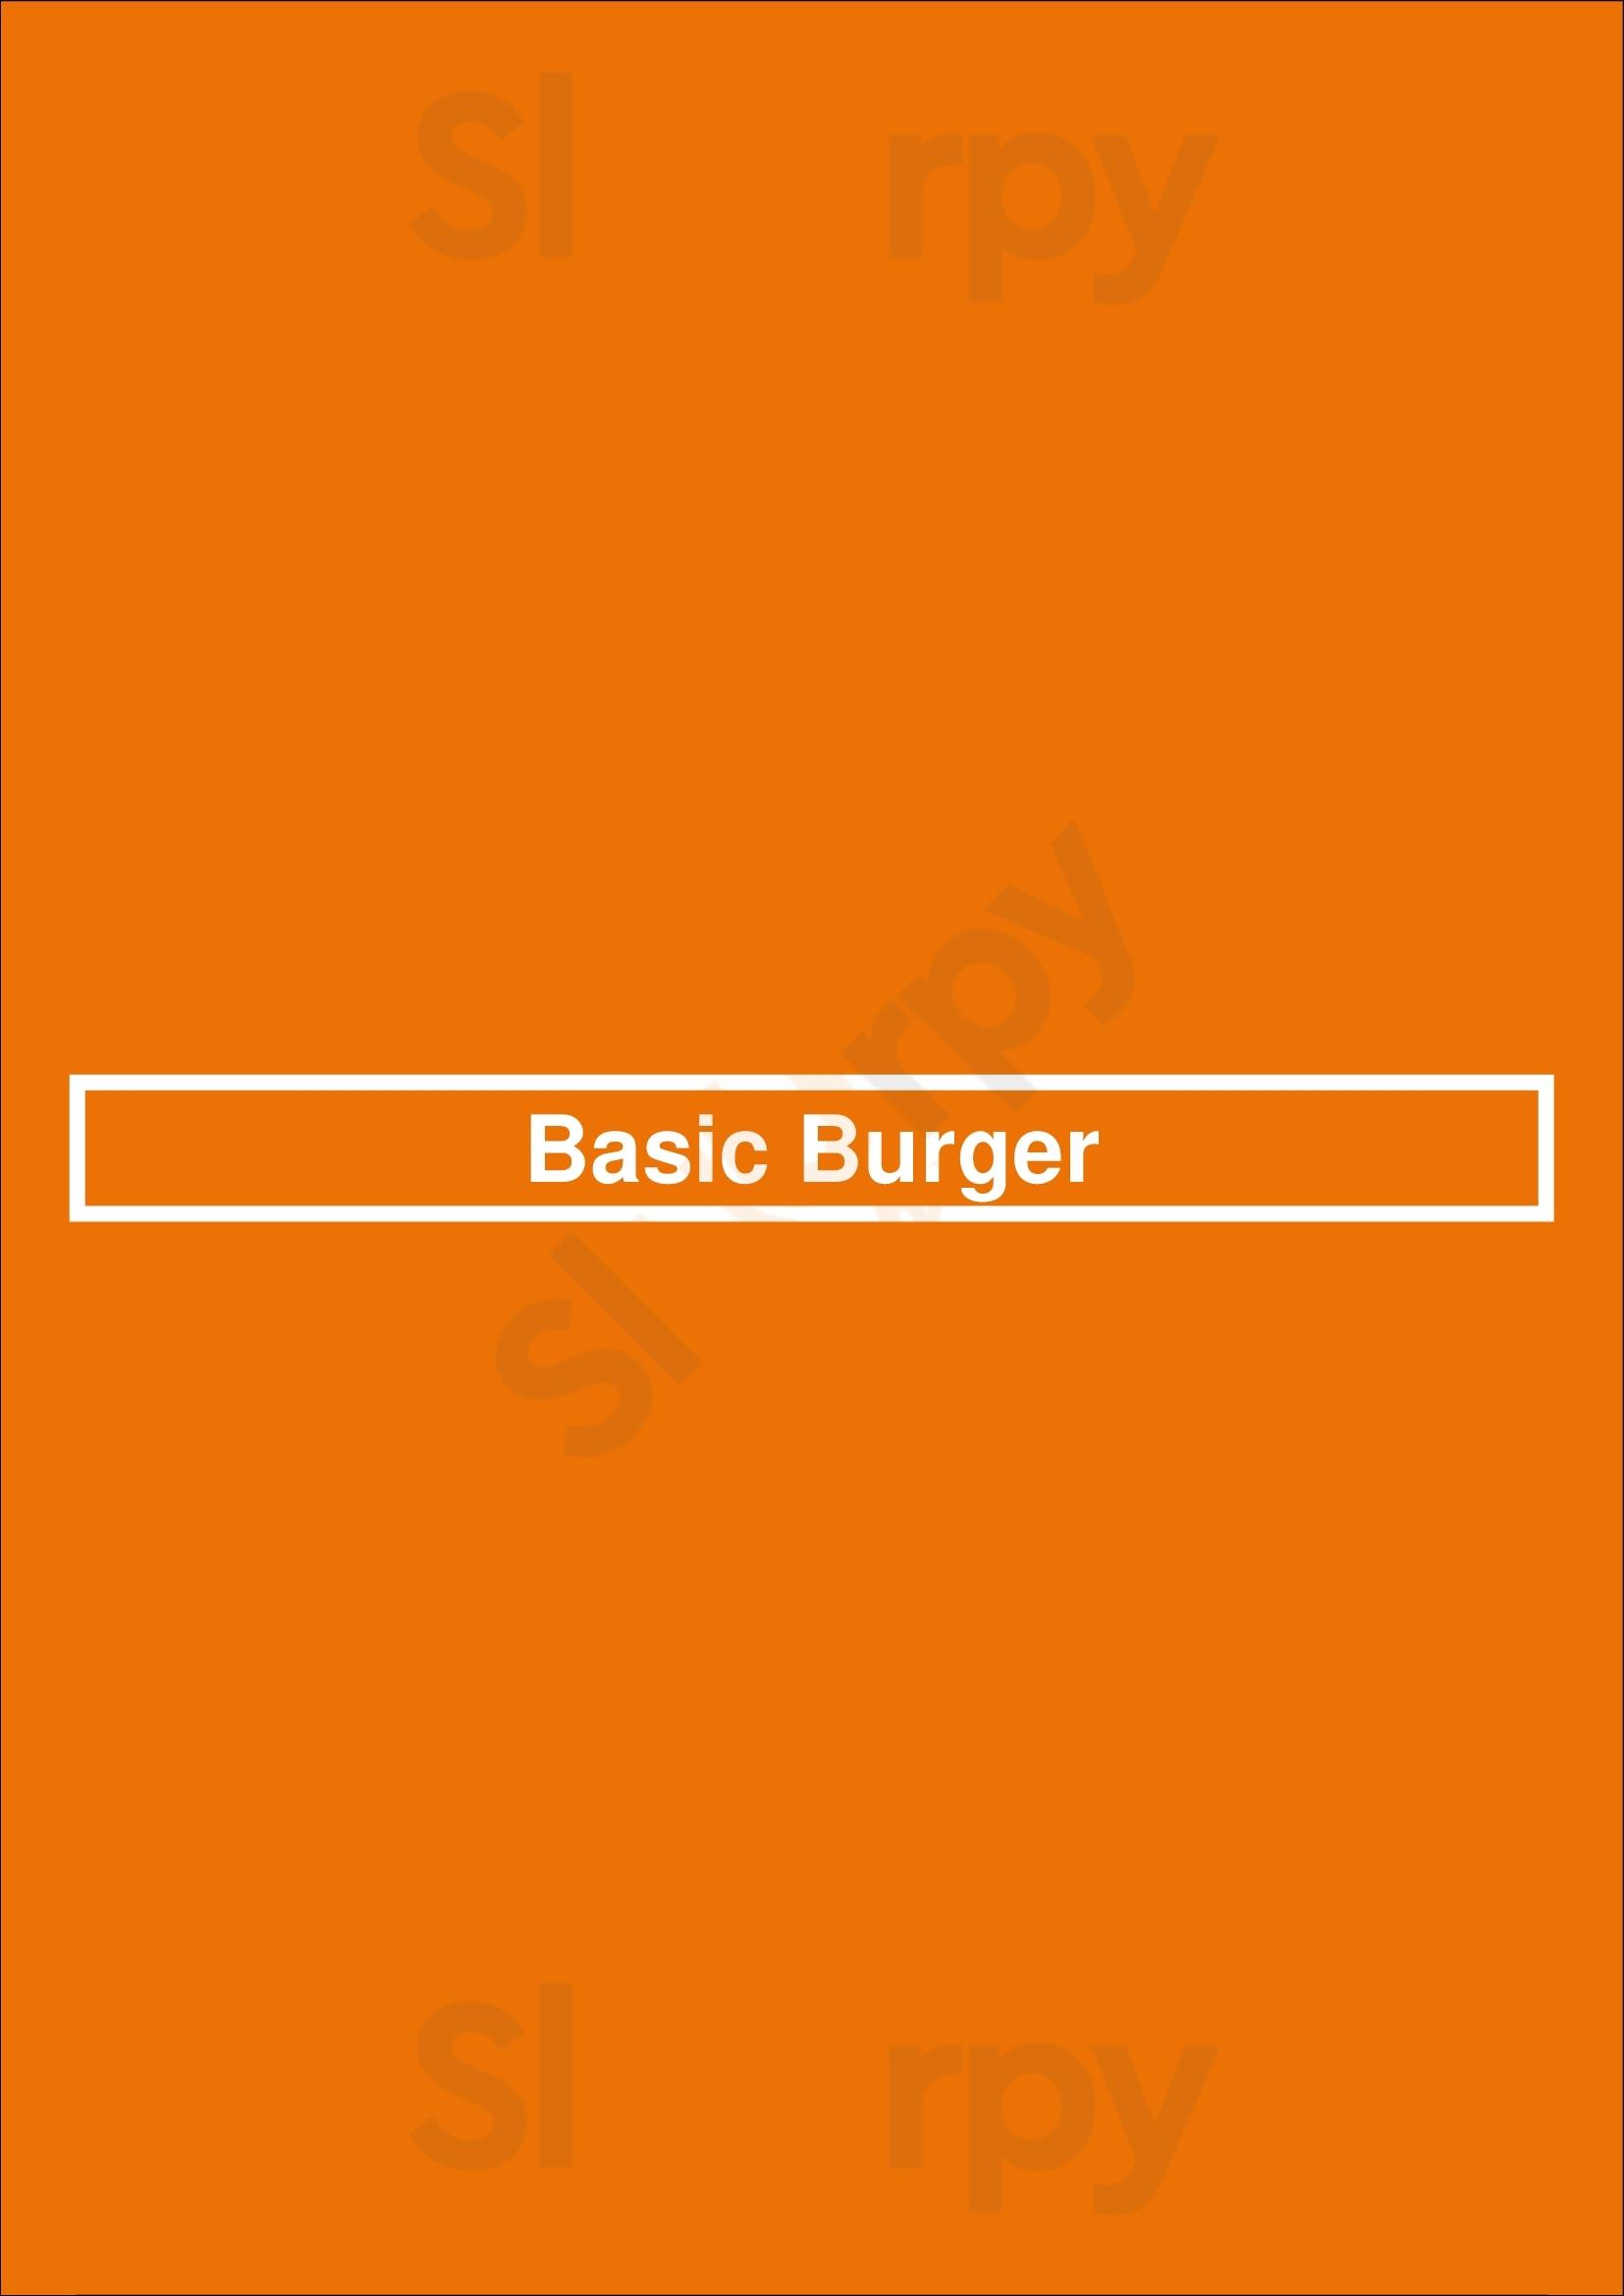 Basic Burger São Paulo Menu - 1